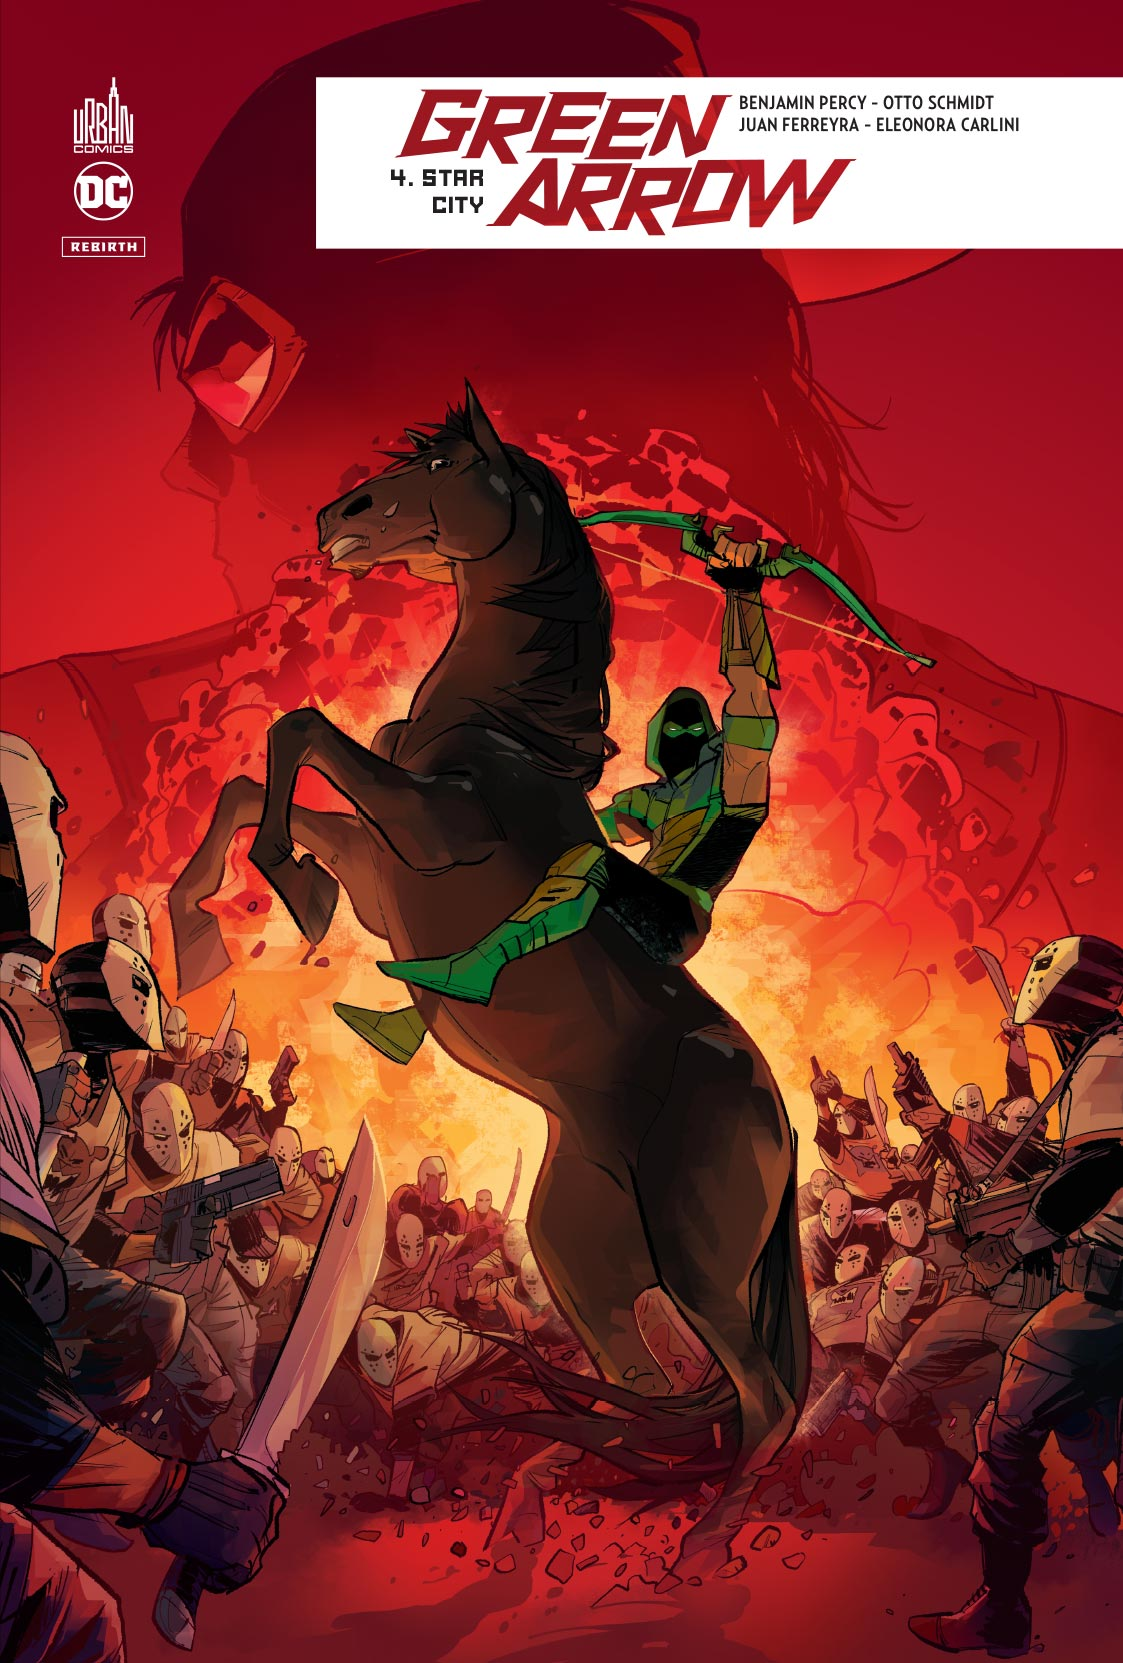 Green Arrow Rebirth 4 - Star City